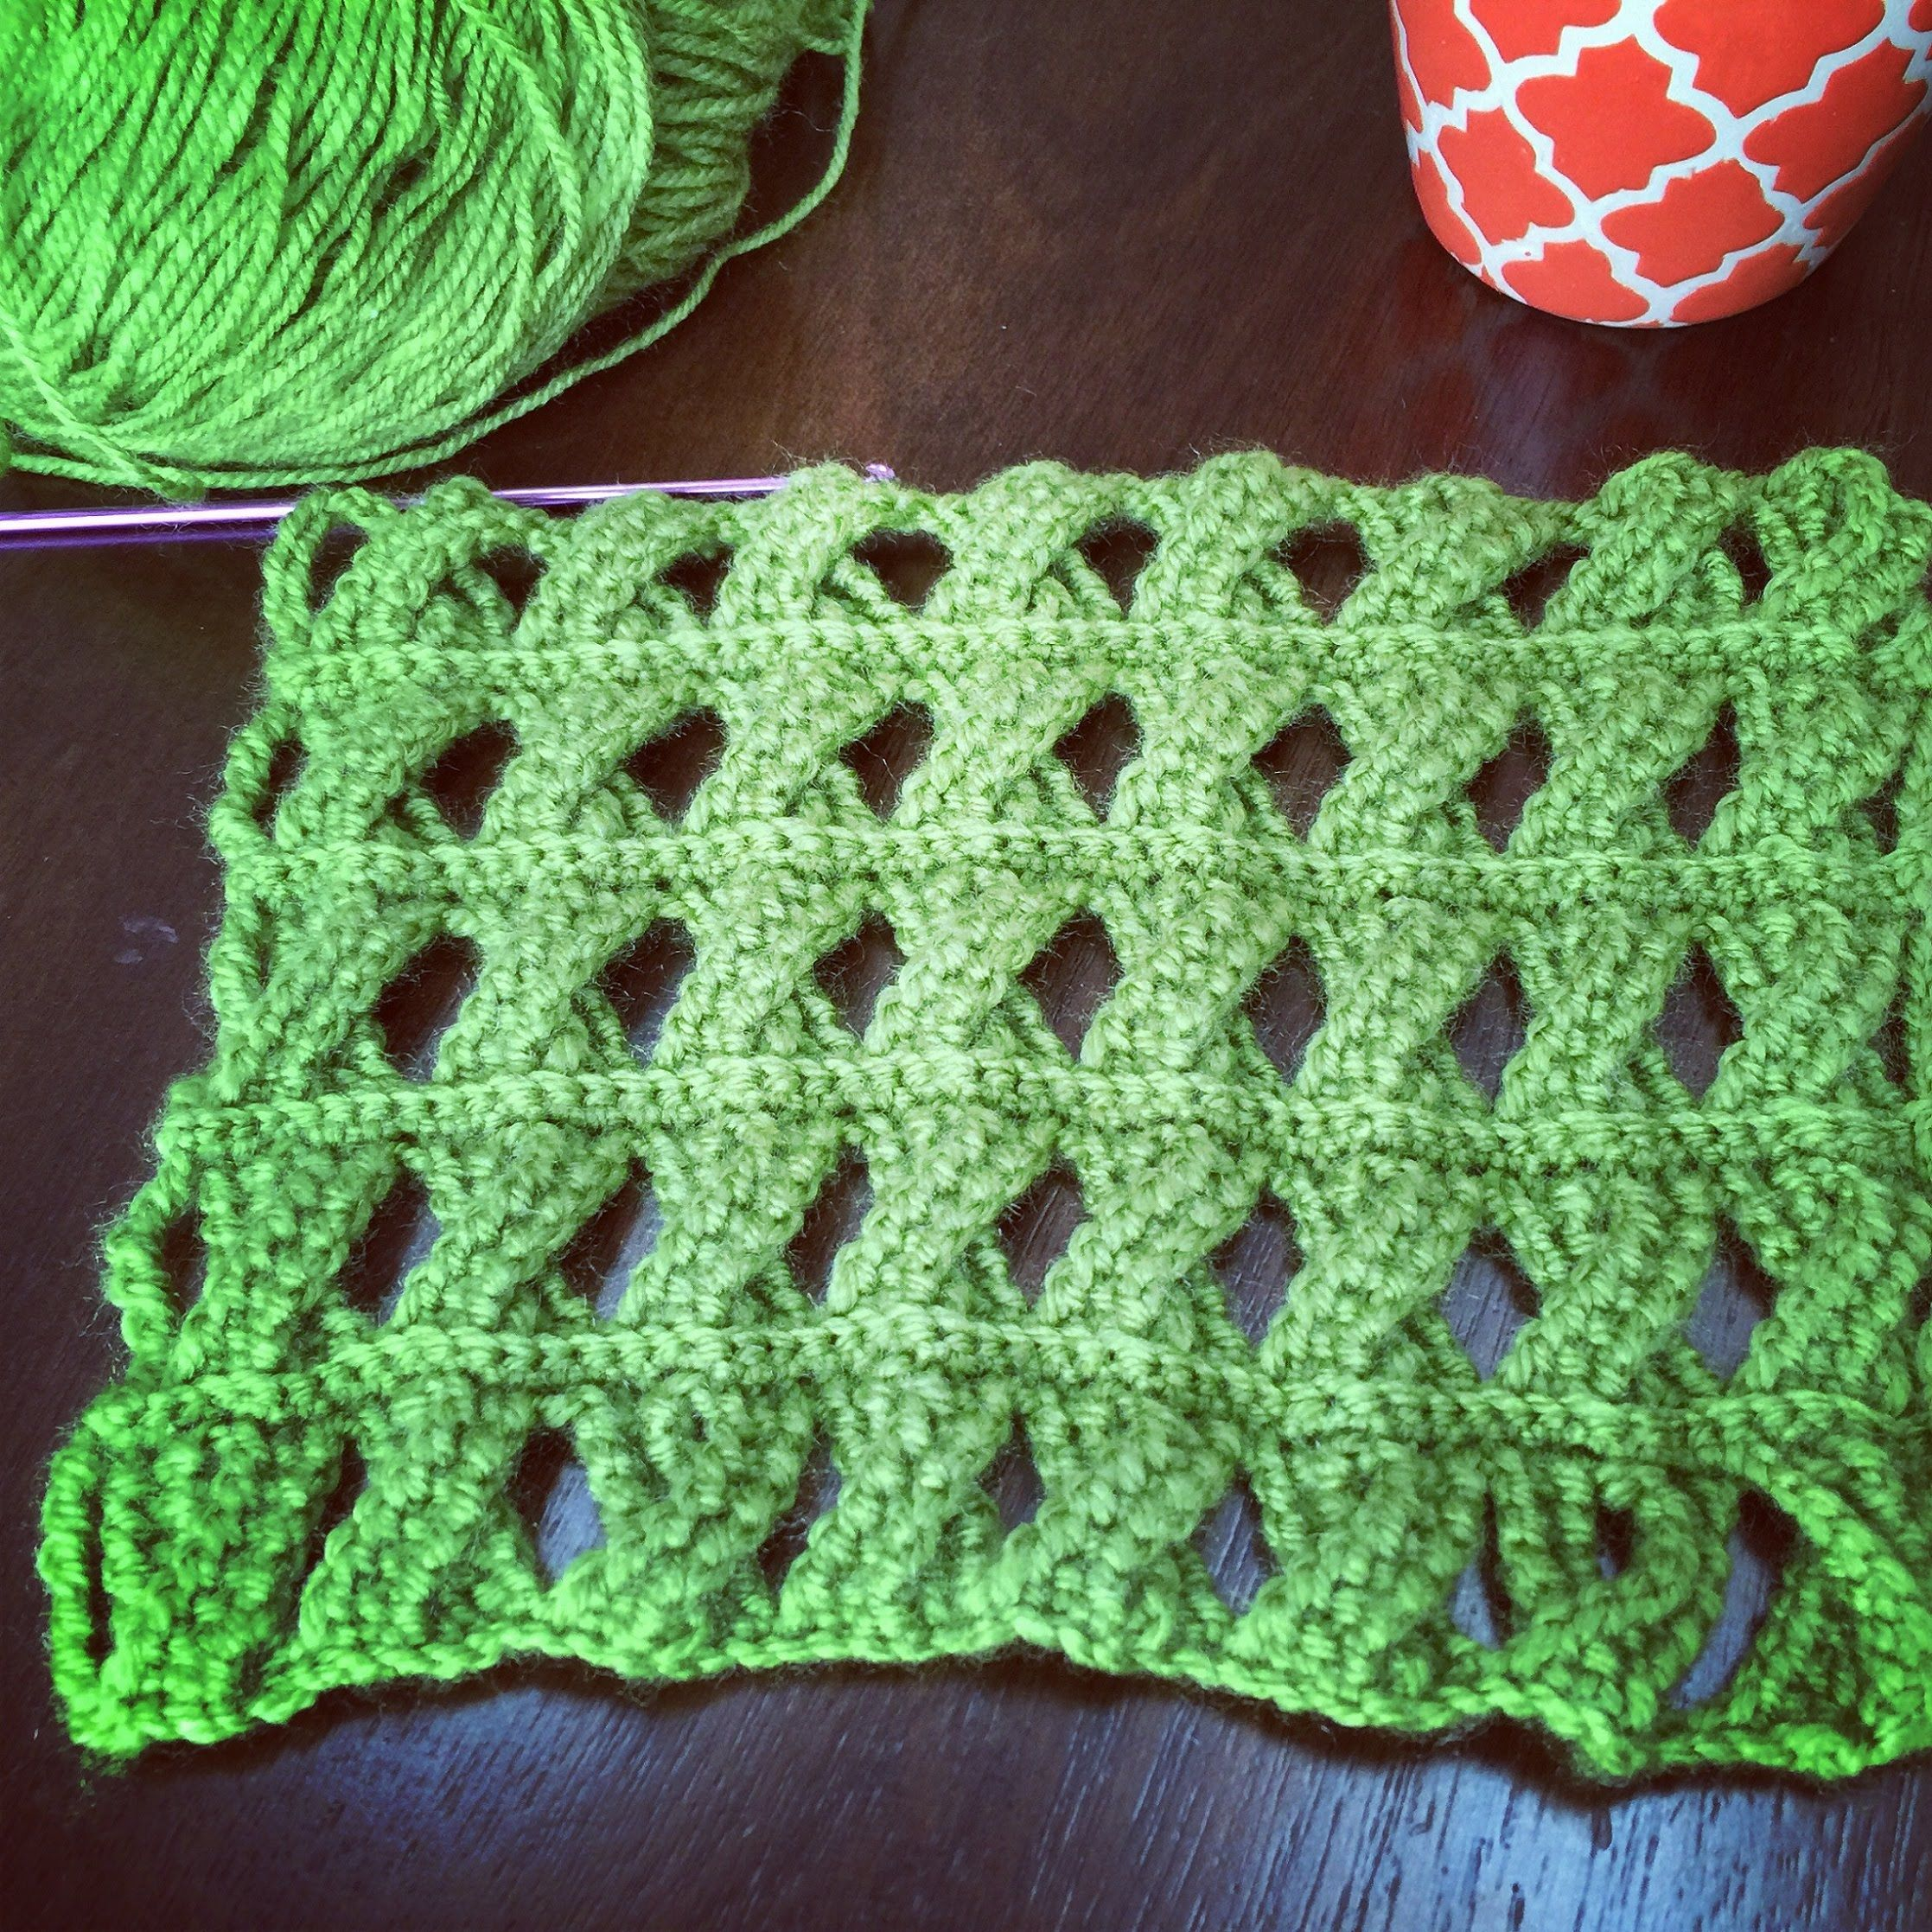 Crochet pattern cable crochet stitch tunisian crochet mustre crochet pattern cable crochet stitch tunisian crochet bankloansurffo Images